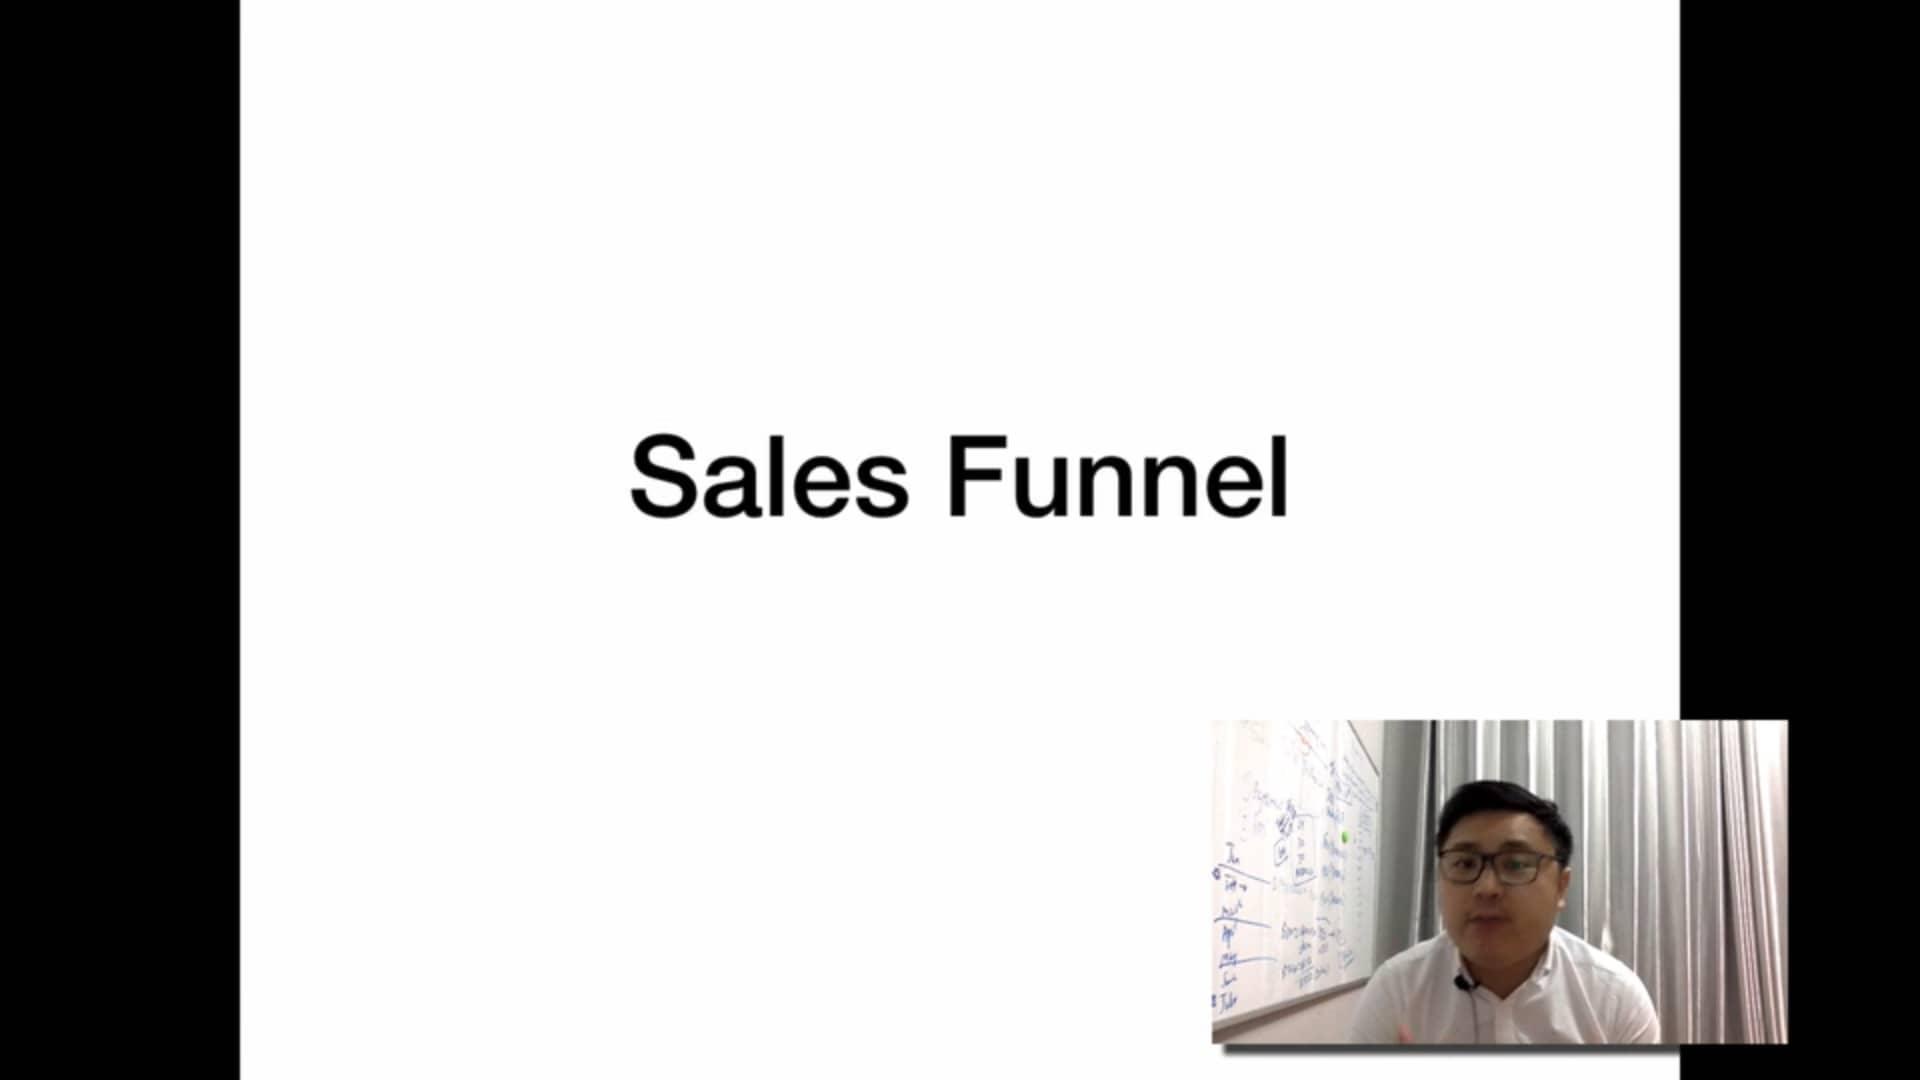 Sales funnel coc marketing 3